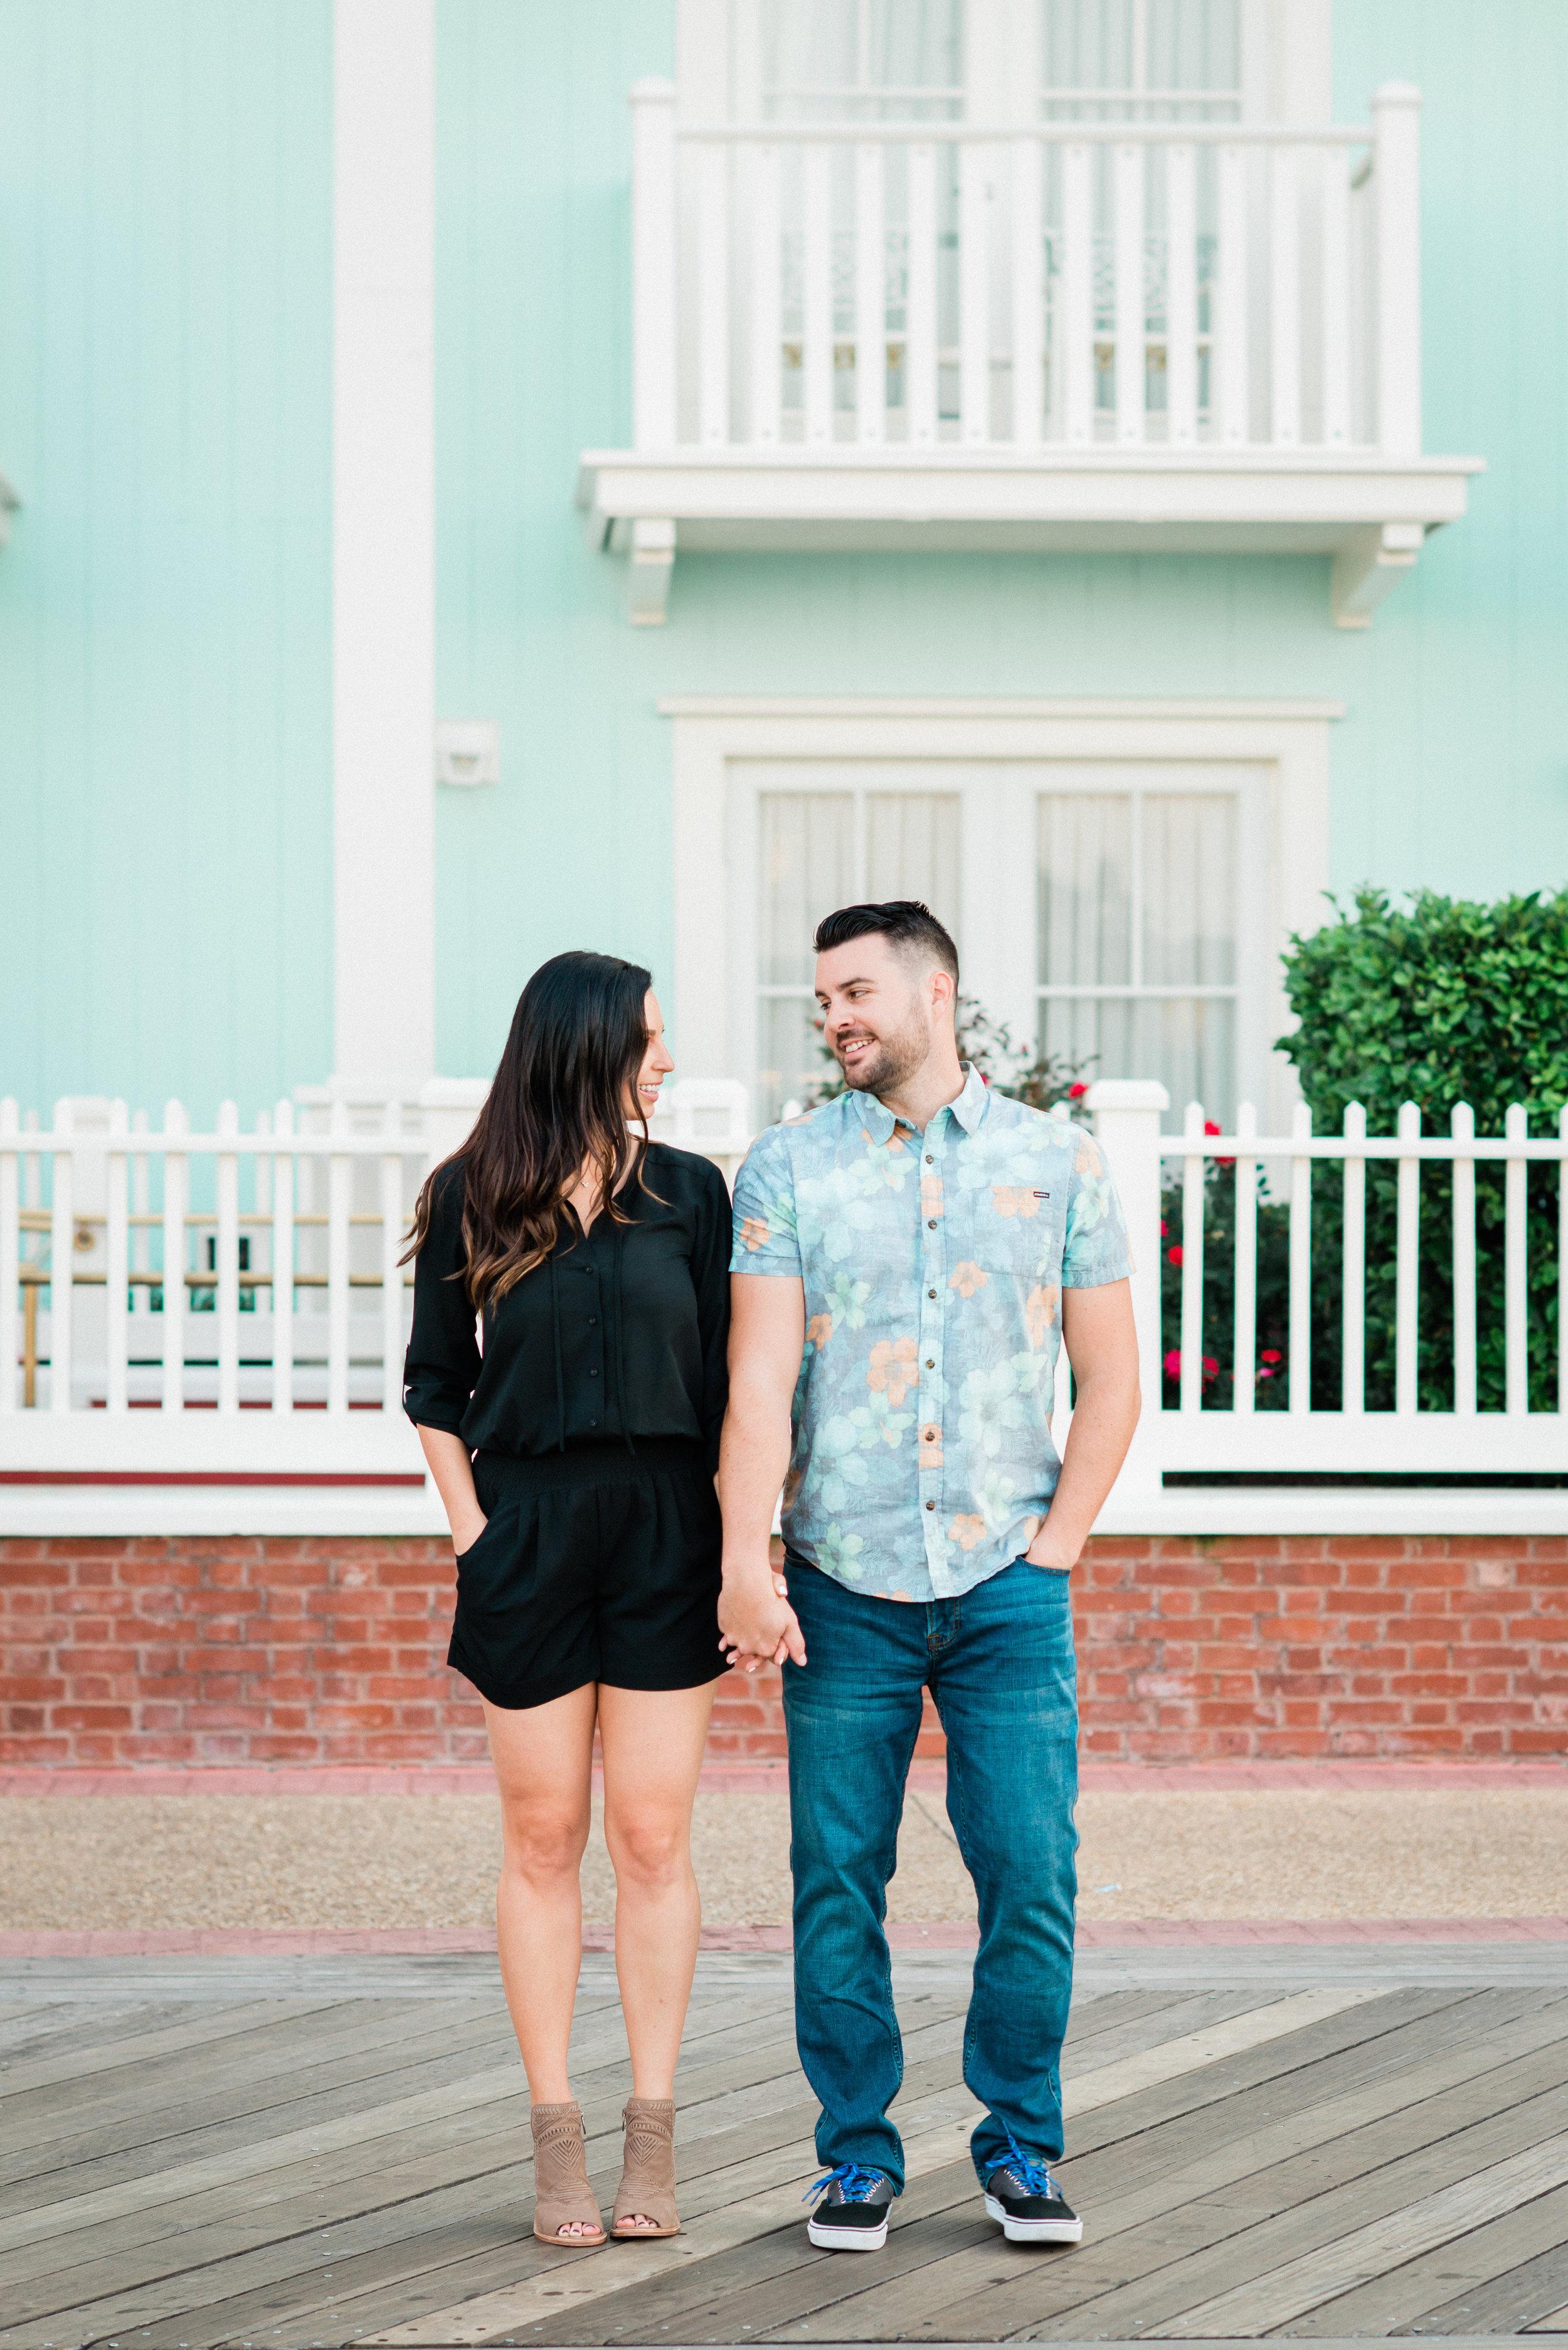 KateTaramykinStudios-Disney-Boardwalk-Couples-Portraits-KatMarc-24.jpg